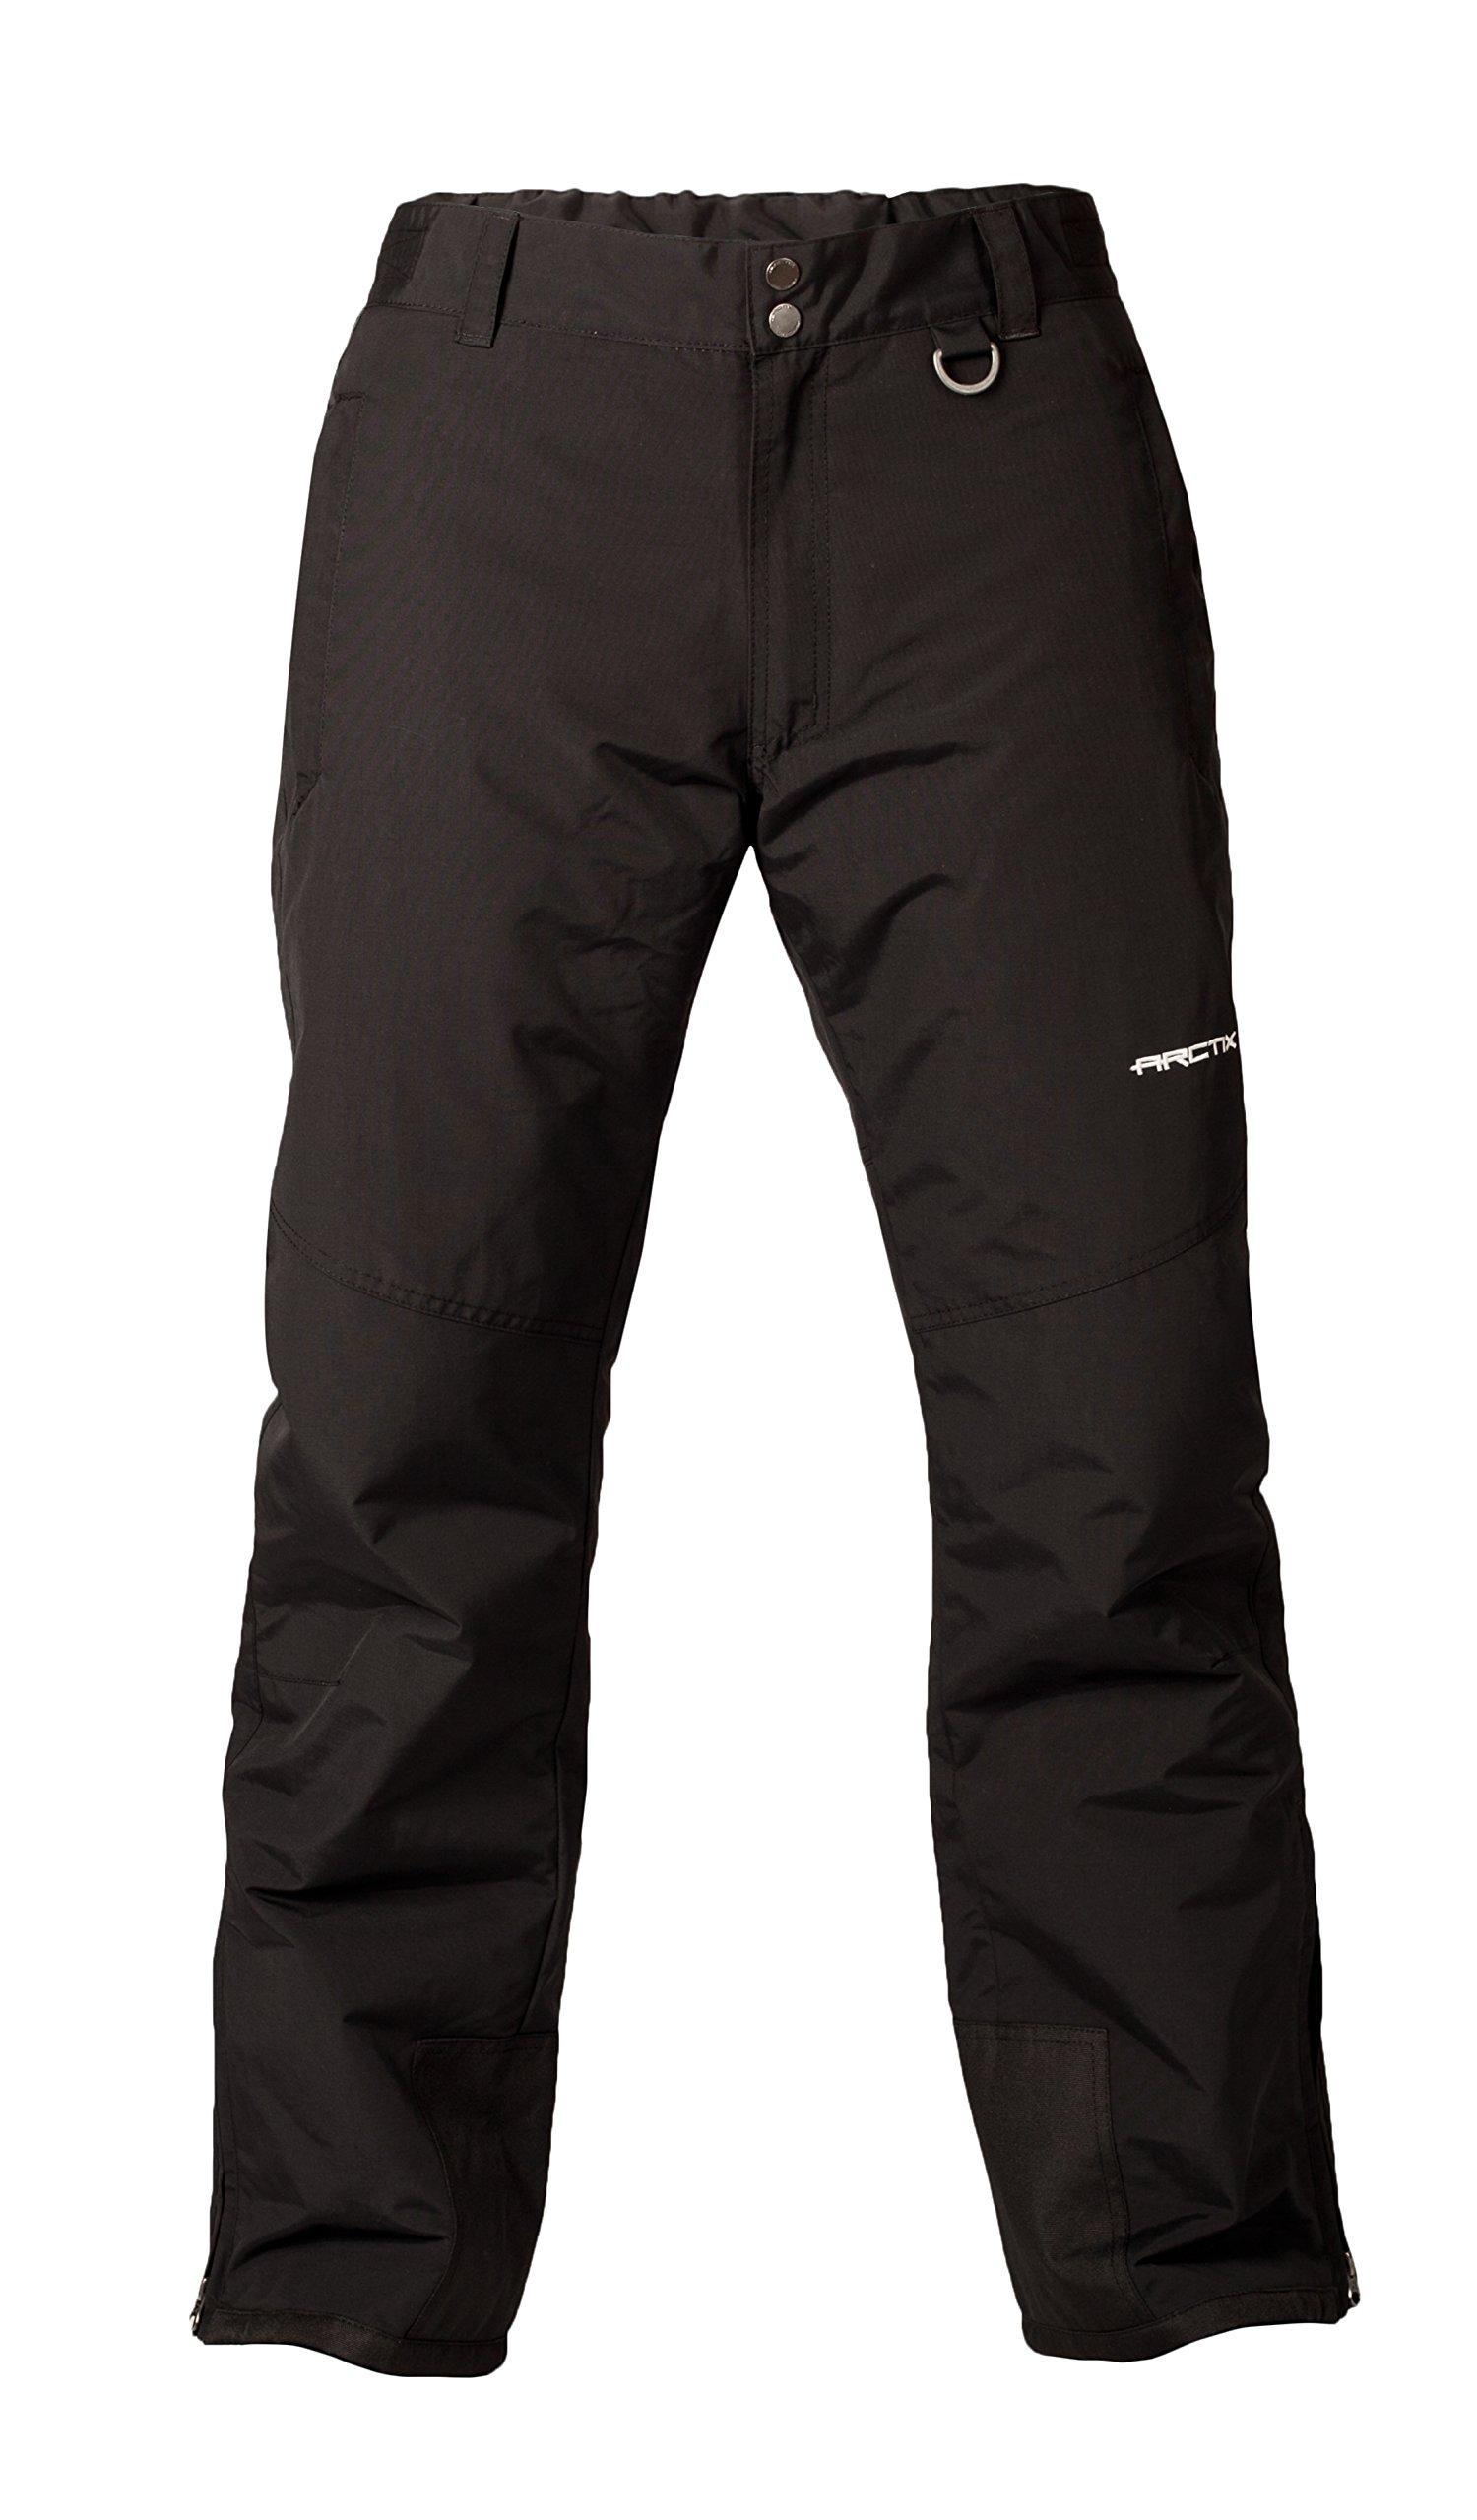 Arctix Men's Mountain Insulated Ski Pants, Black, Medium (32-34W 32L) by Arctix